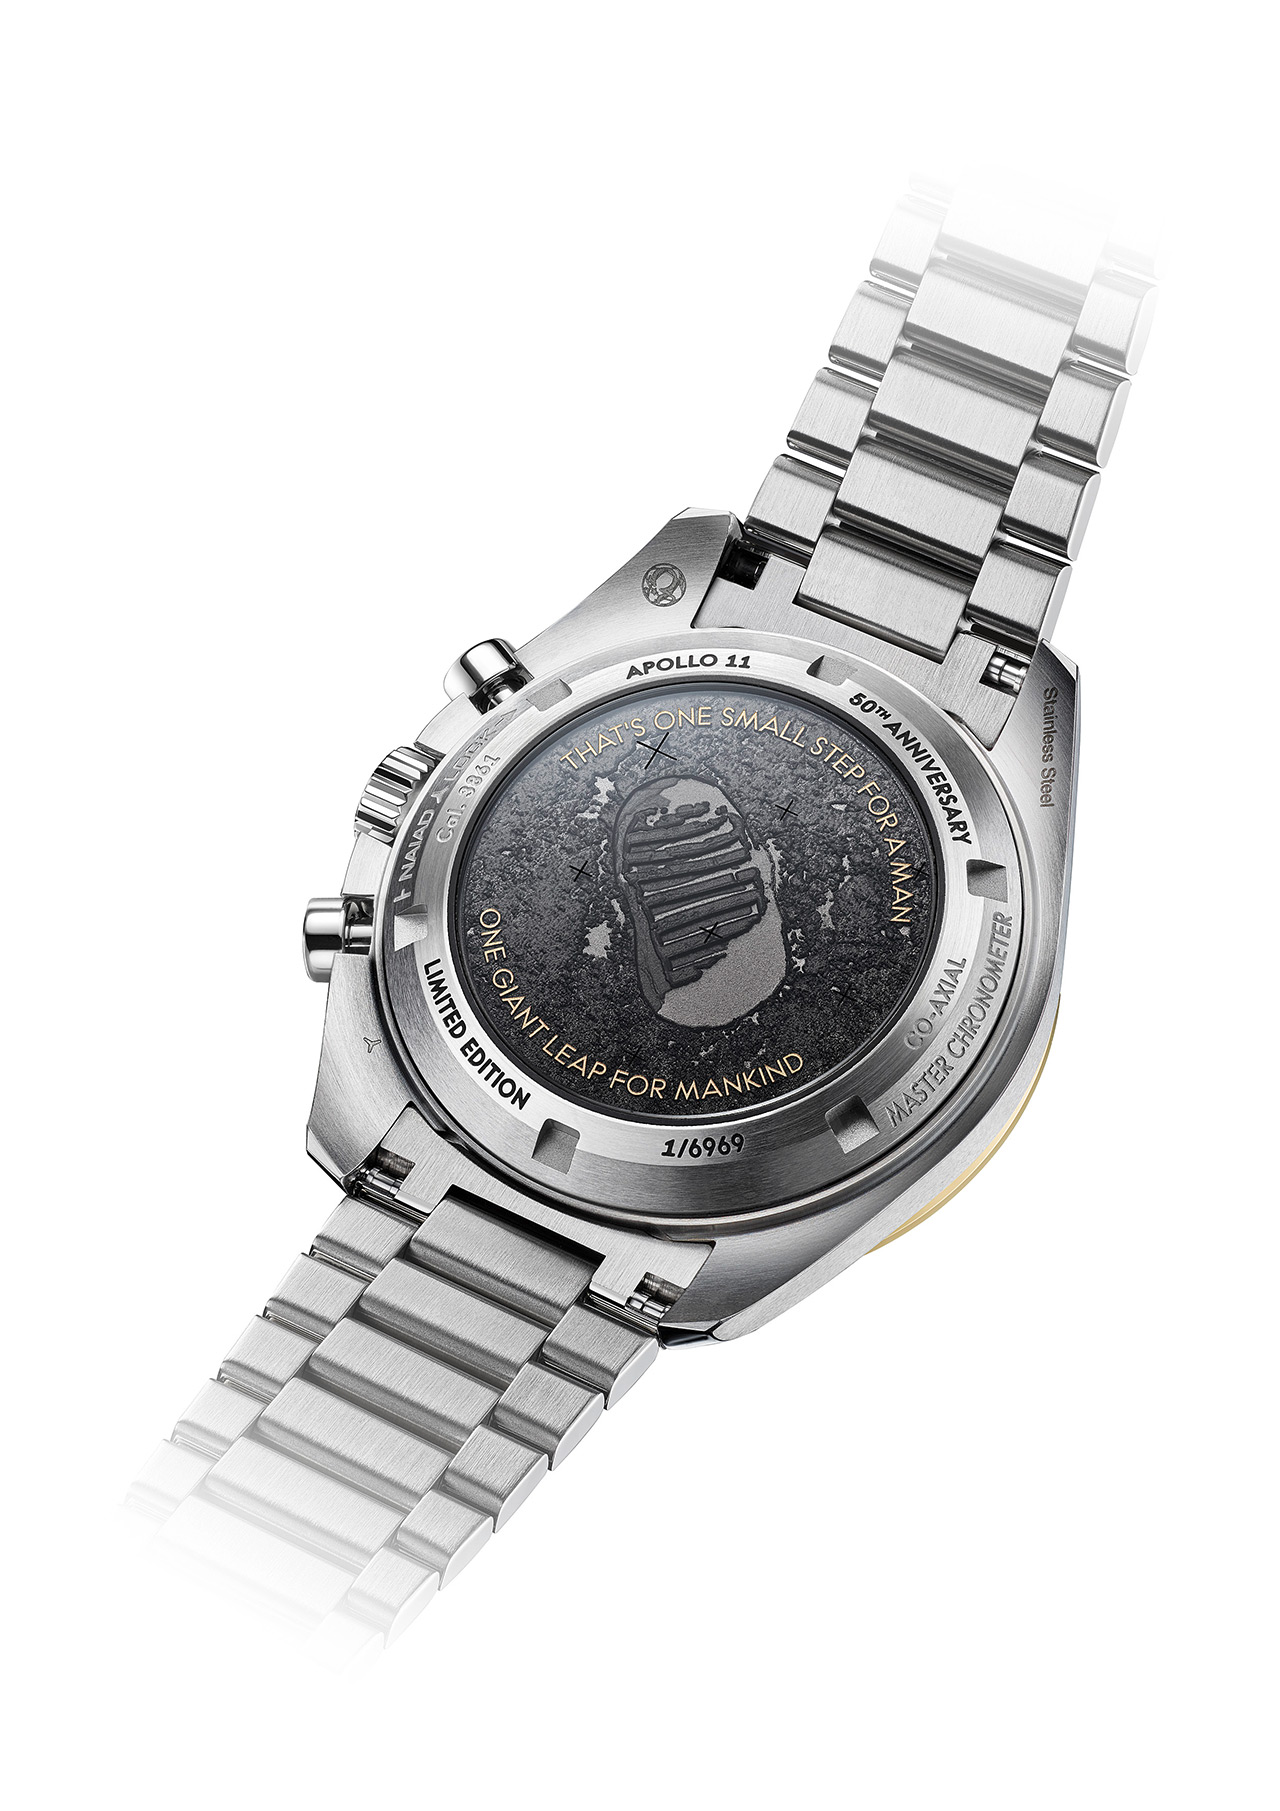 Omega Celebrates Iconic Hours Of Apollo 11 With New Speedmaster